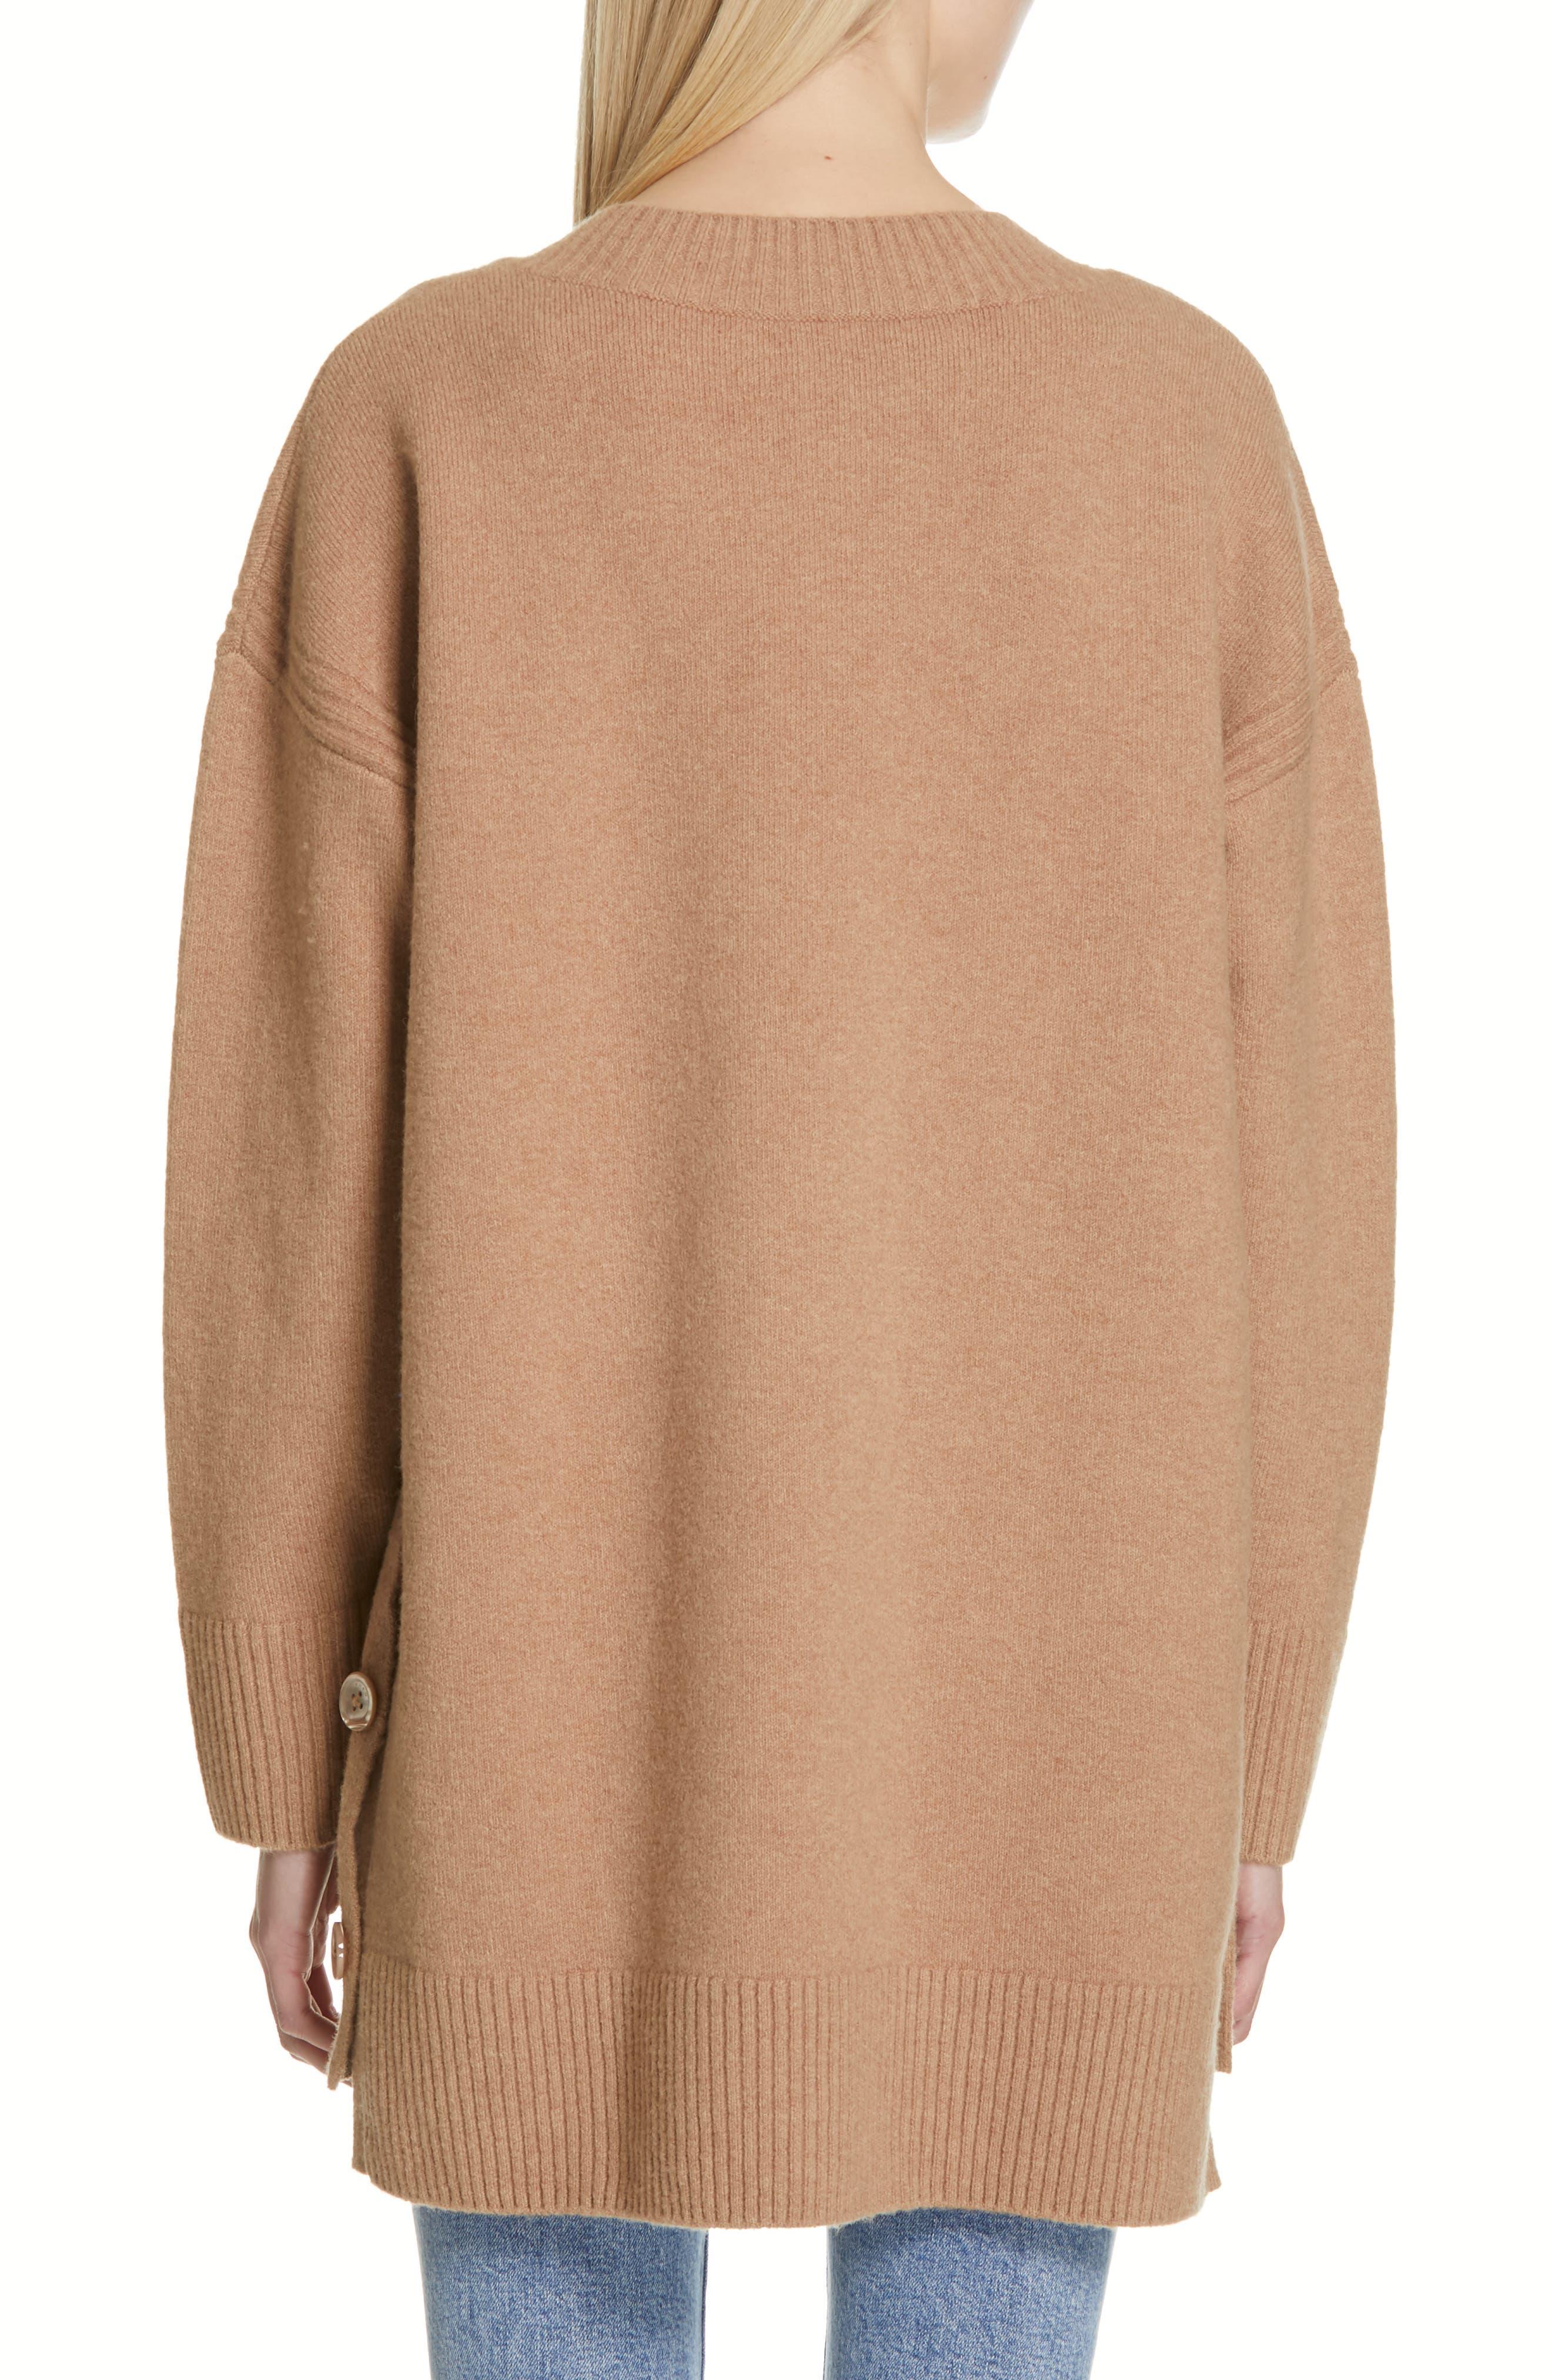 Cortis Merino Wool & Alpaca Blend Sweater,                             Alternate thumbnail 2, color,                             CAMEL